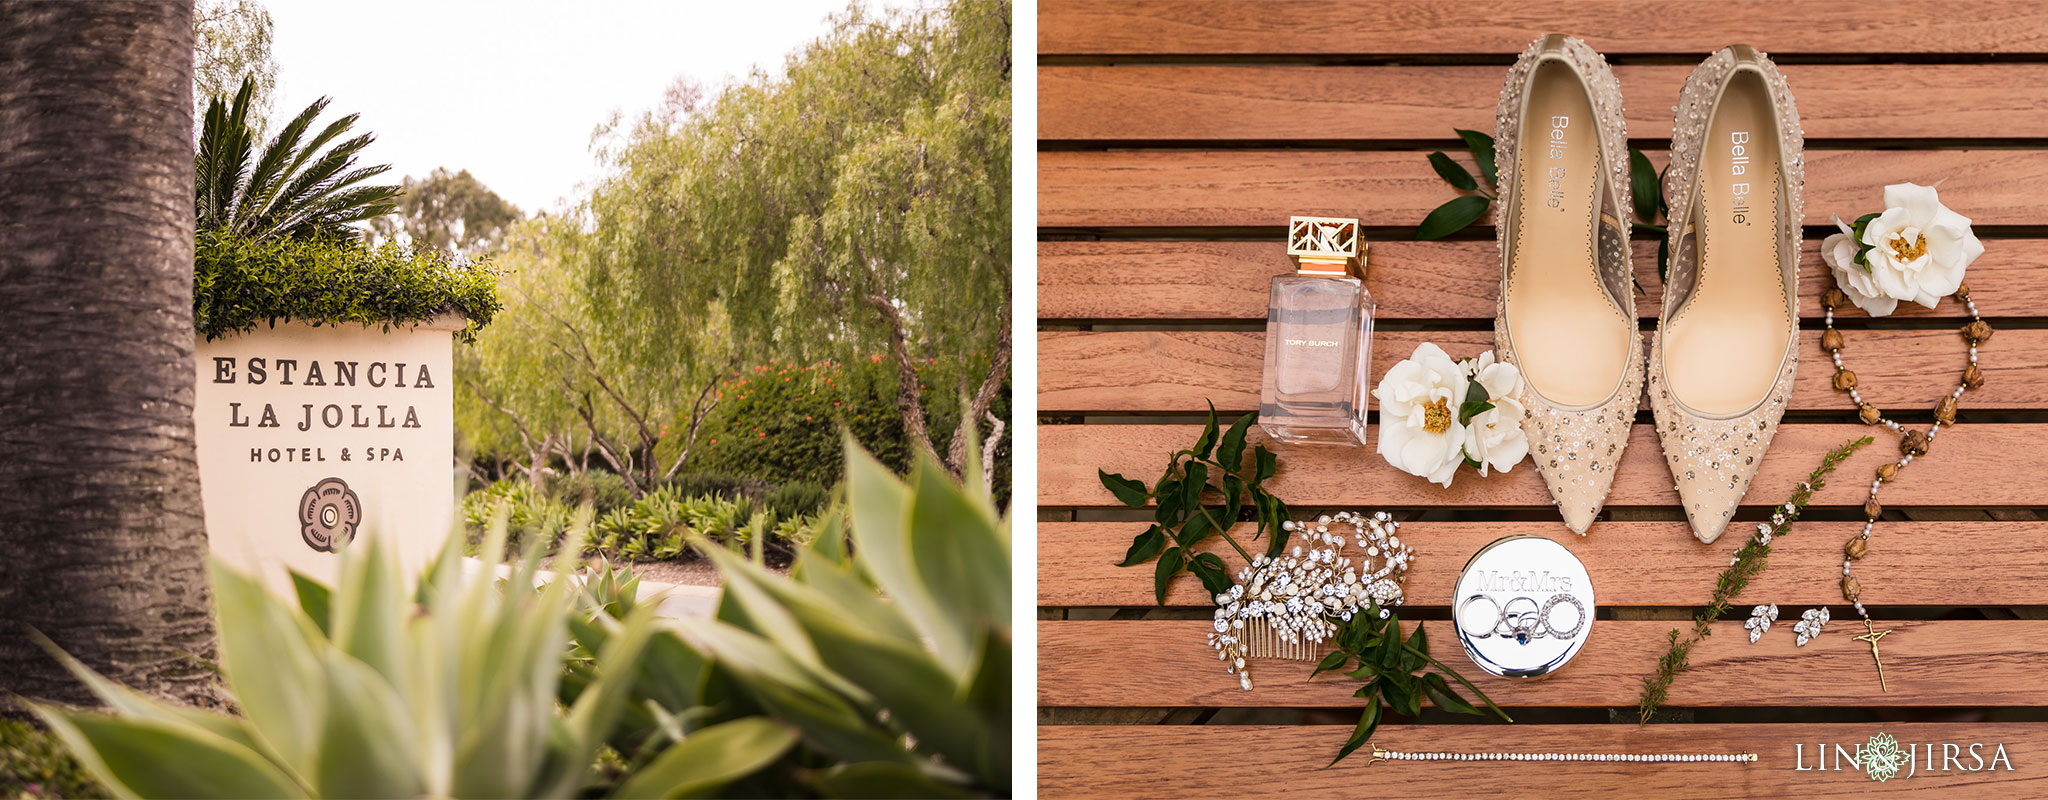 01 estancia la jolla hotel and spa wedding photography